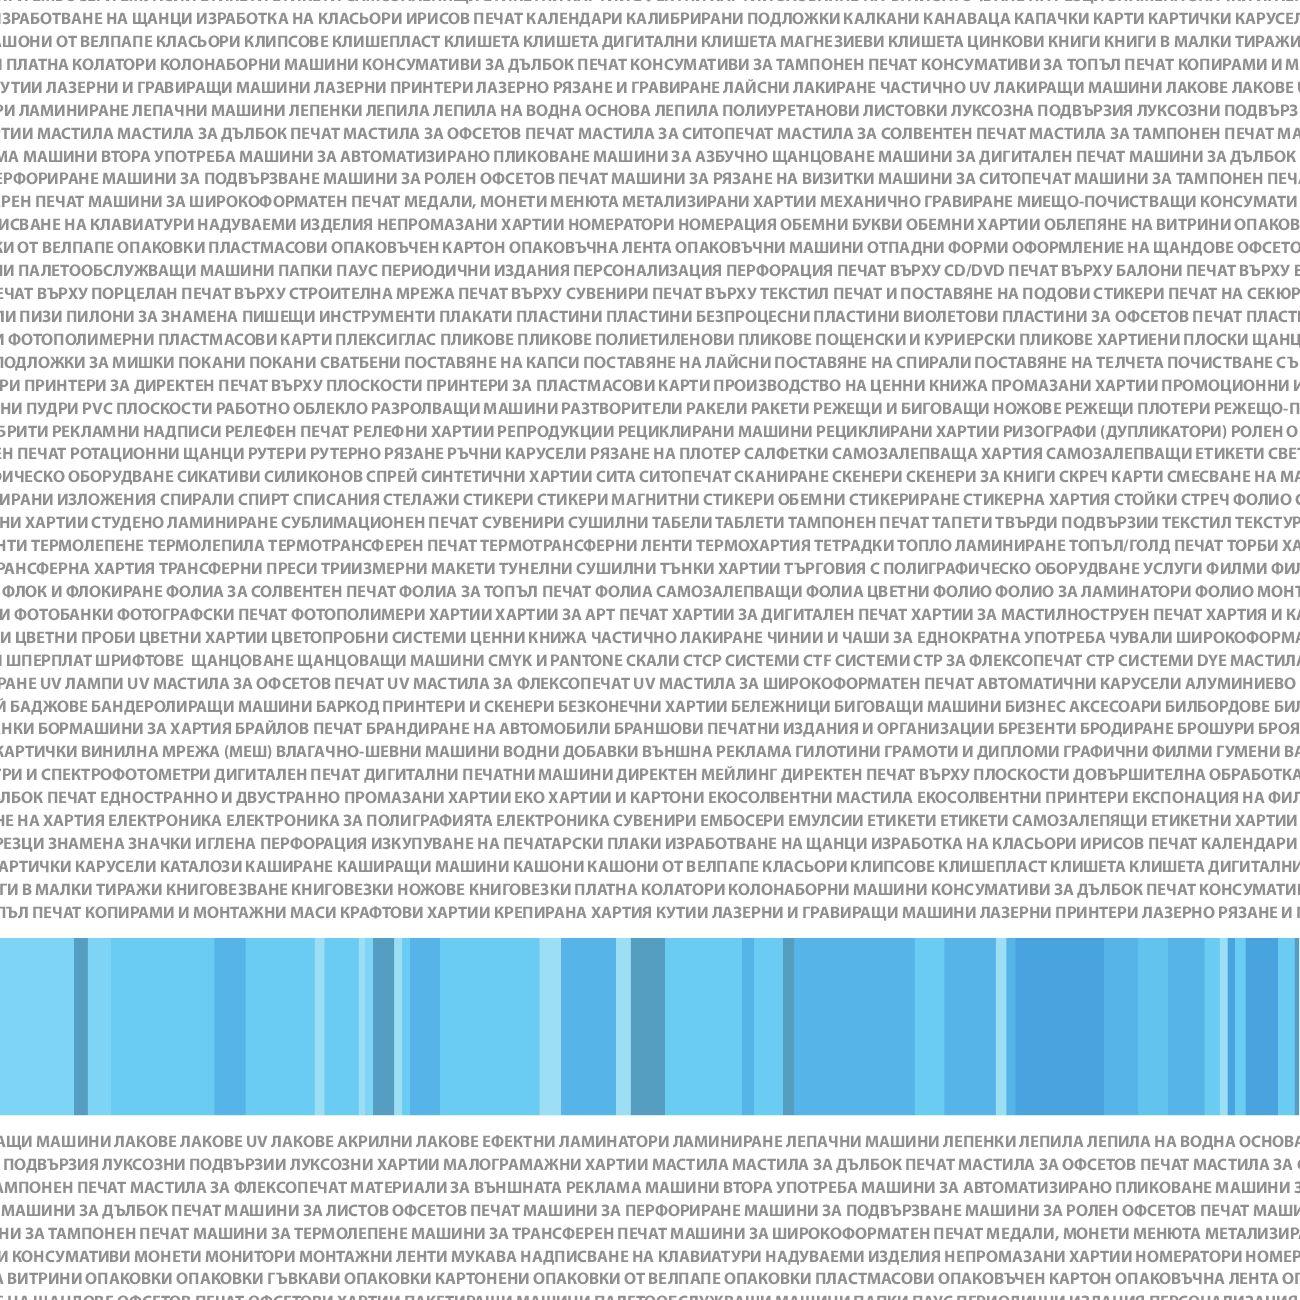 895c7cfb387 Polygraphy Info 2009 by dessy todorova - issuu